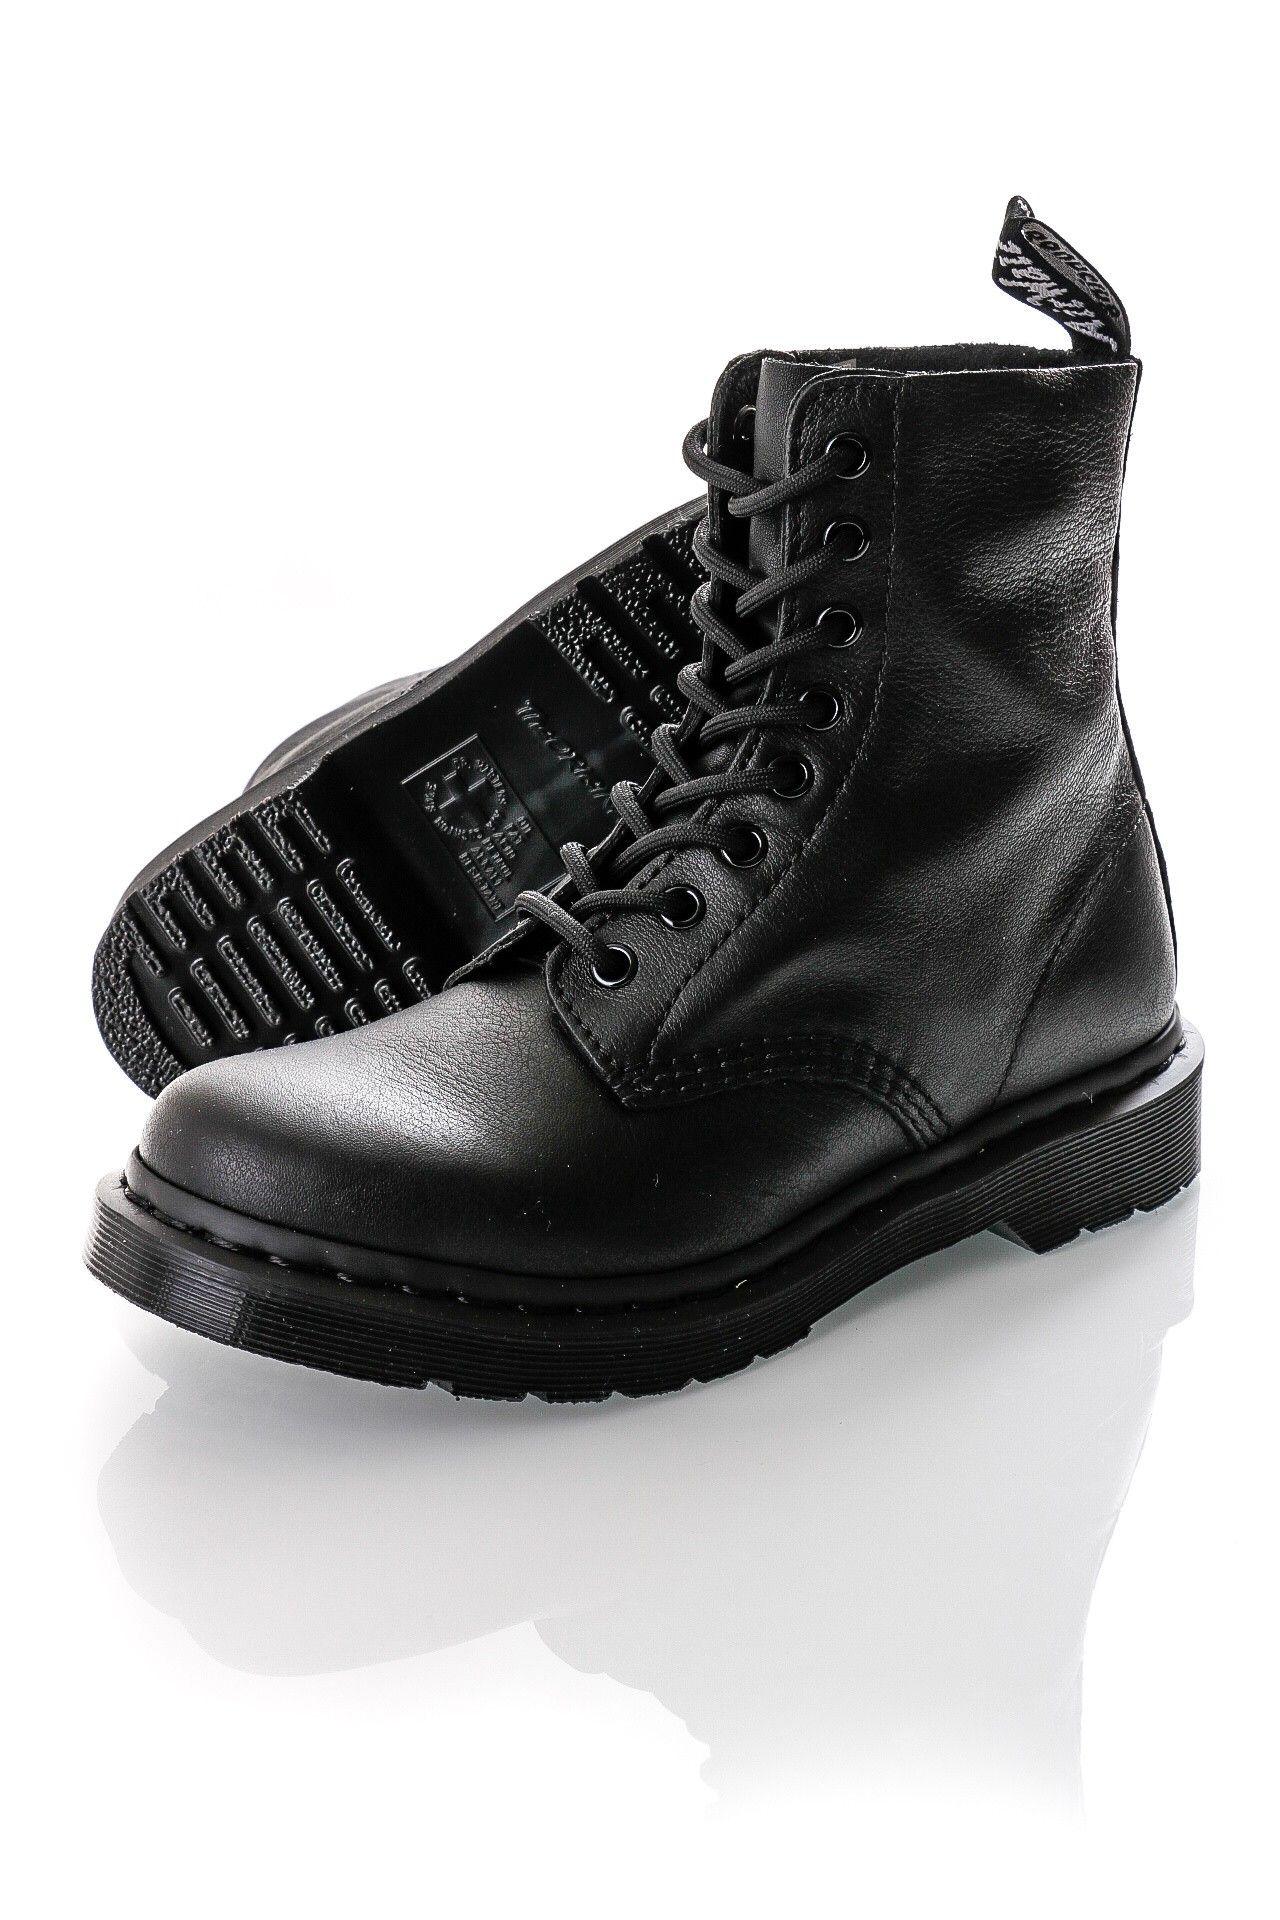 Afbeelding van Dr. Martens Boots 1460 Pascal mono Black Virginia 24735001 (24479001)